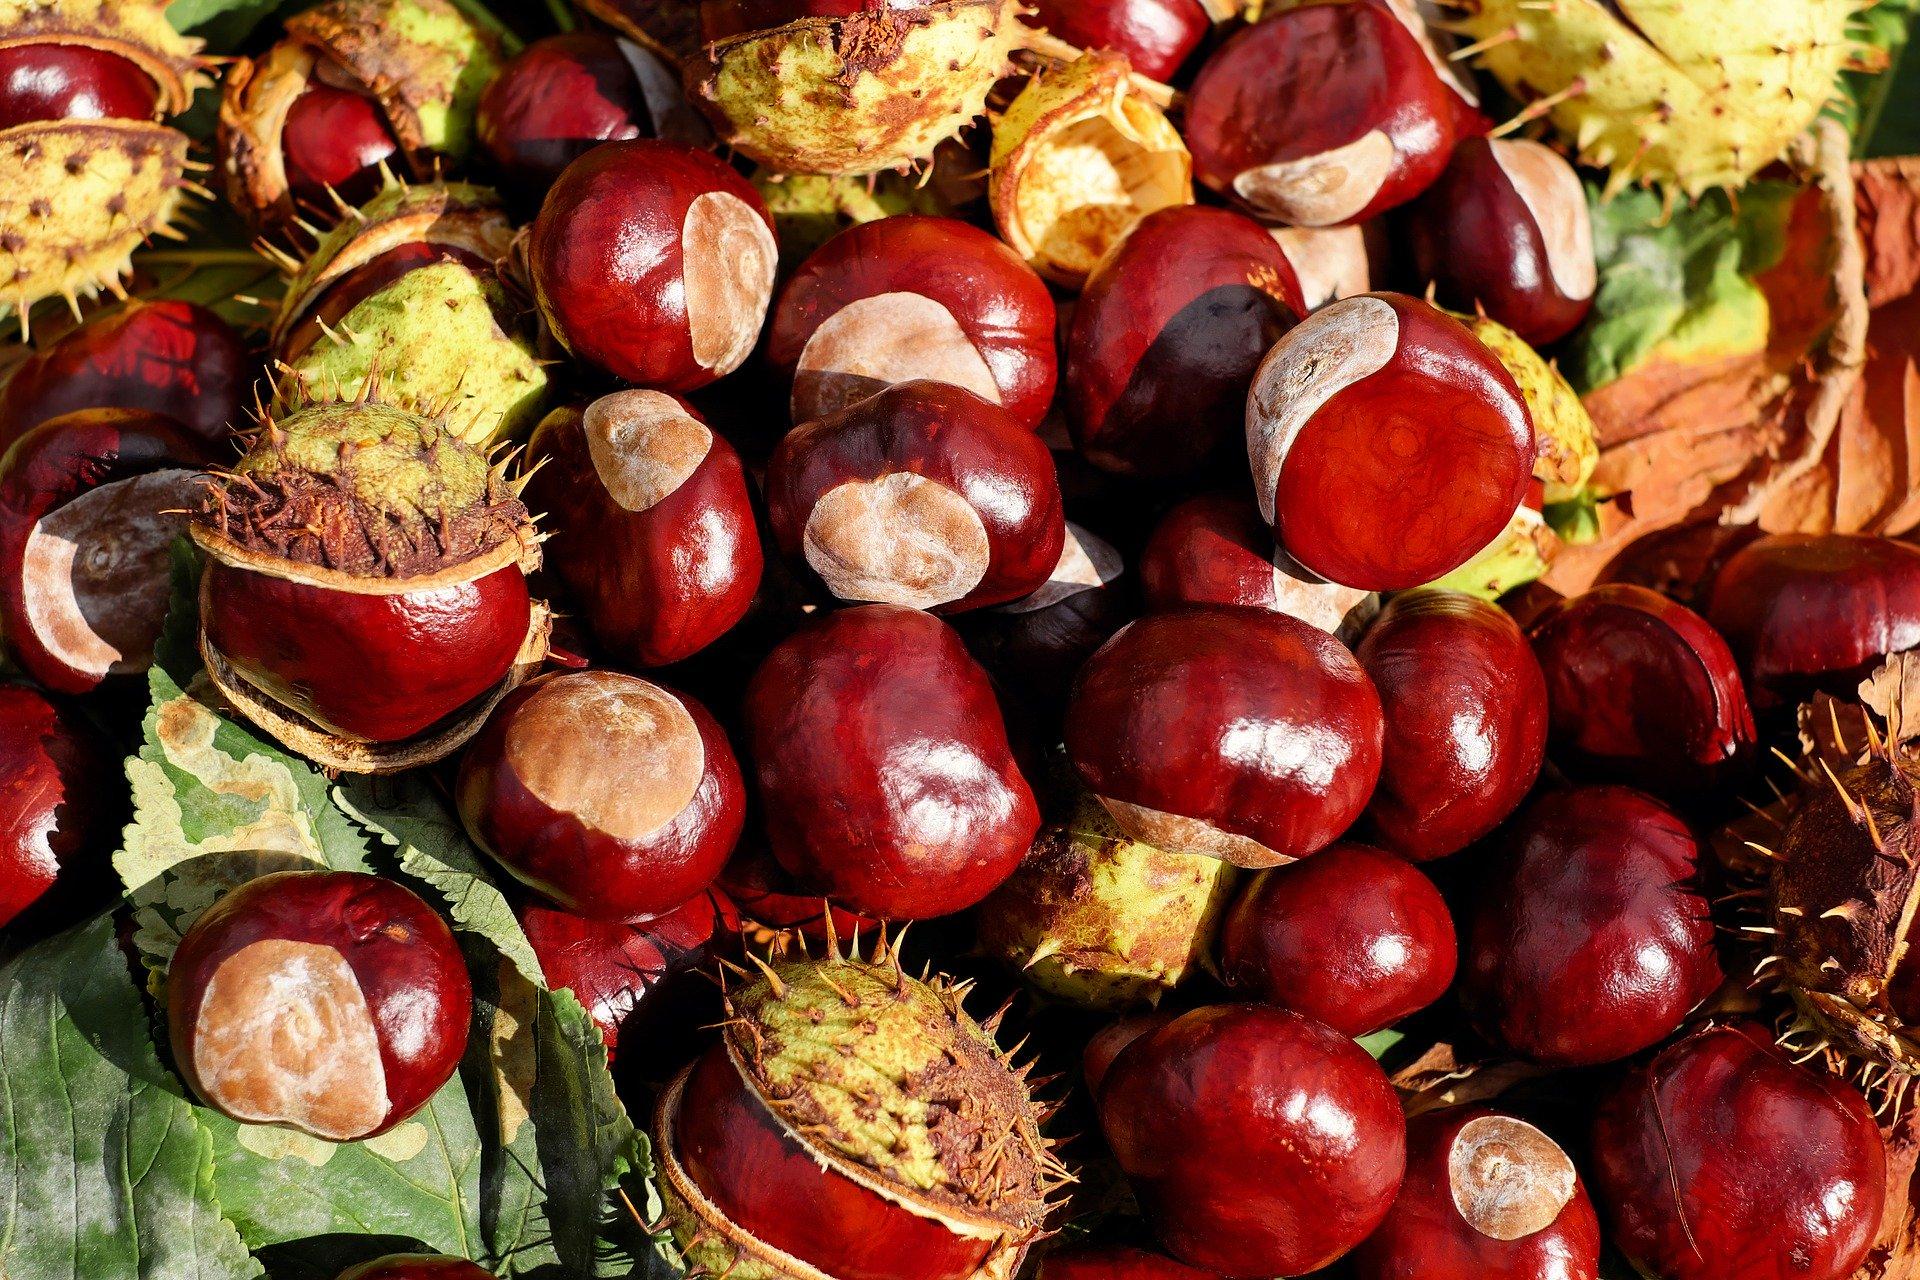 https://pixabay.com/it/photos/castagno-buckeye-frutta-rosso-1710430/